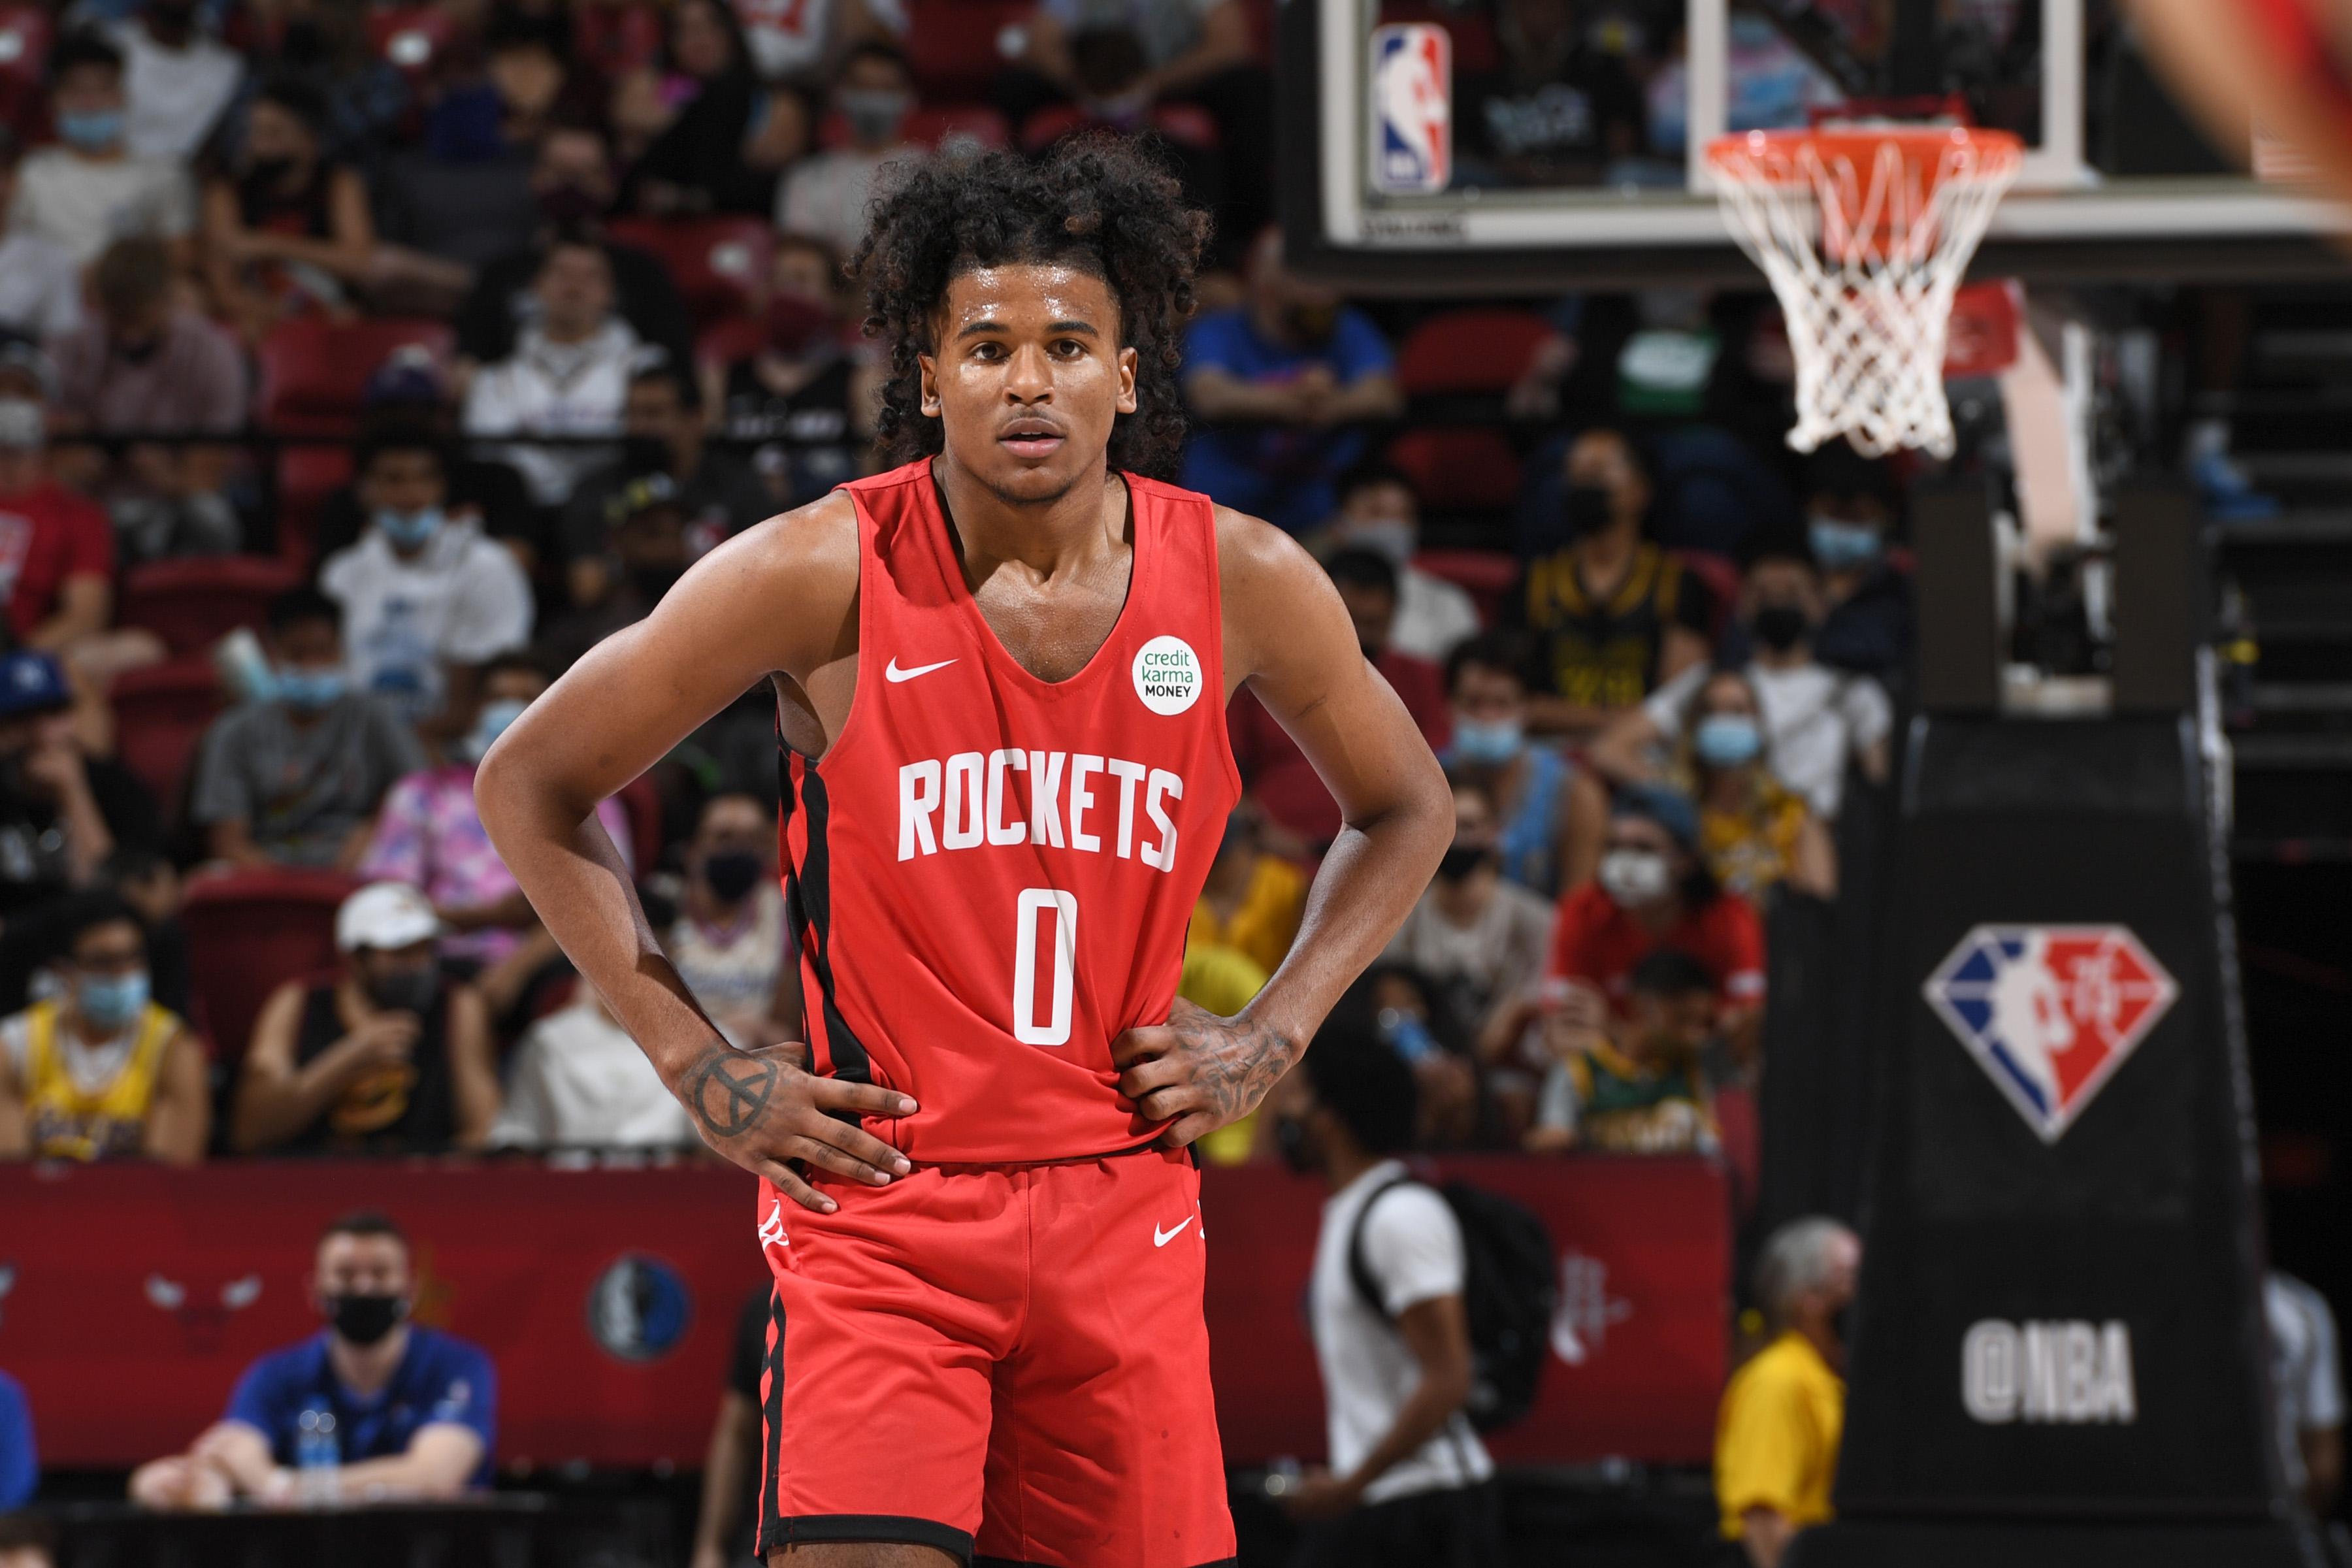 2021 Las Vegas Summer League - Houston Rockets v Cleveland Cavaliers